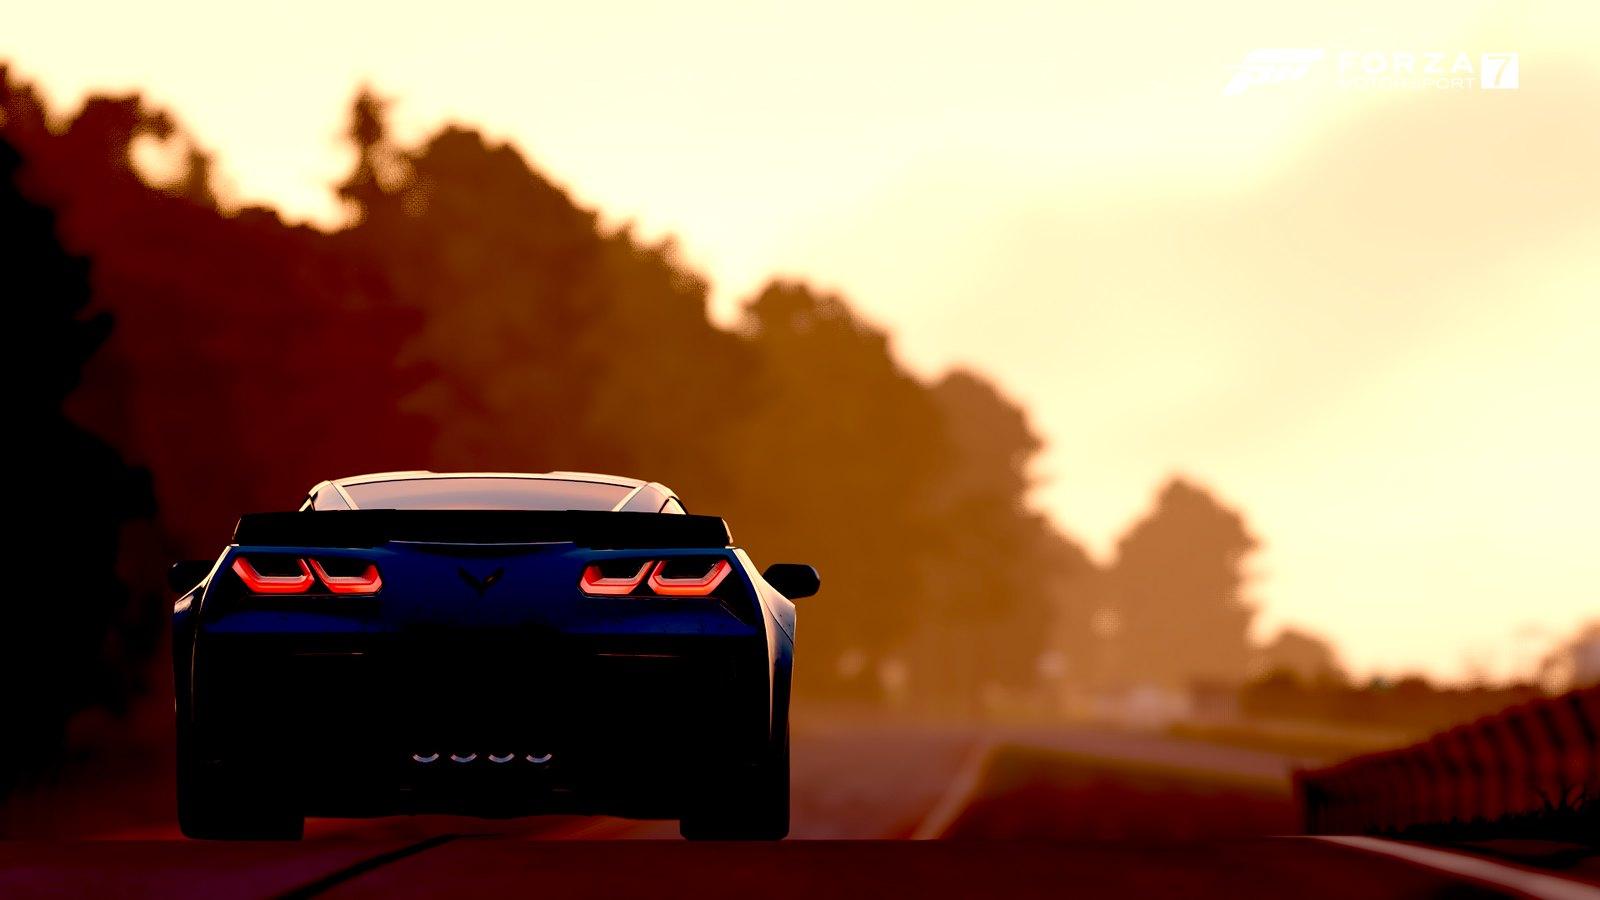 38931445784_0b97ad408c_h ForzaMotorsport.fr